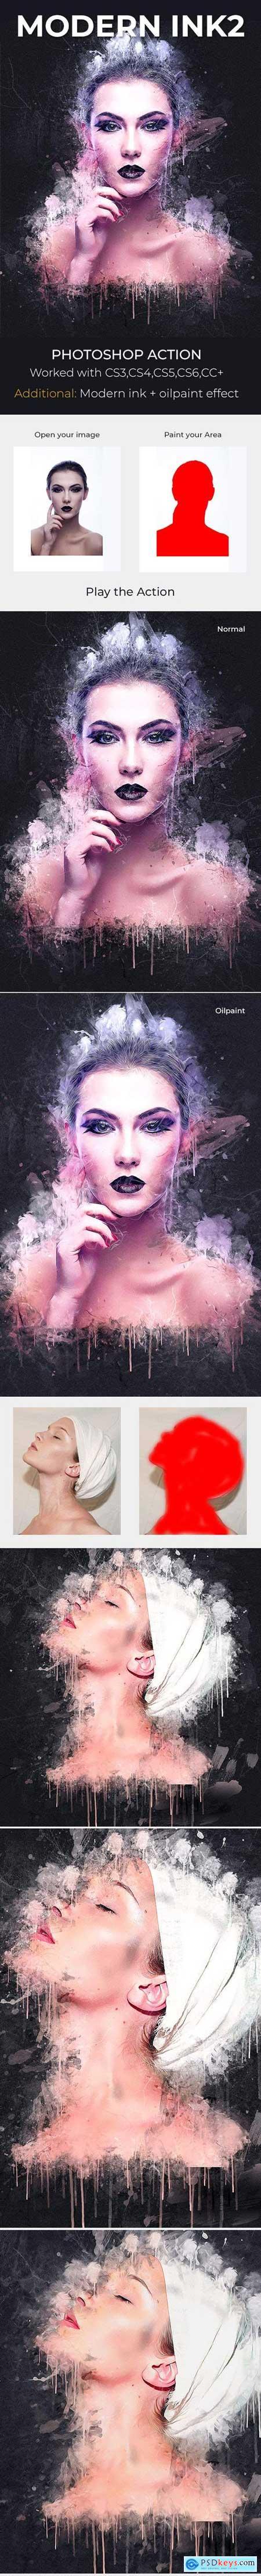 Modern Ink2 Photoshop Action 21208822